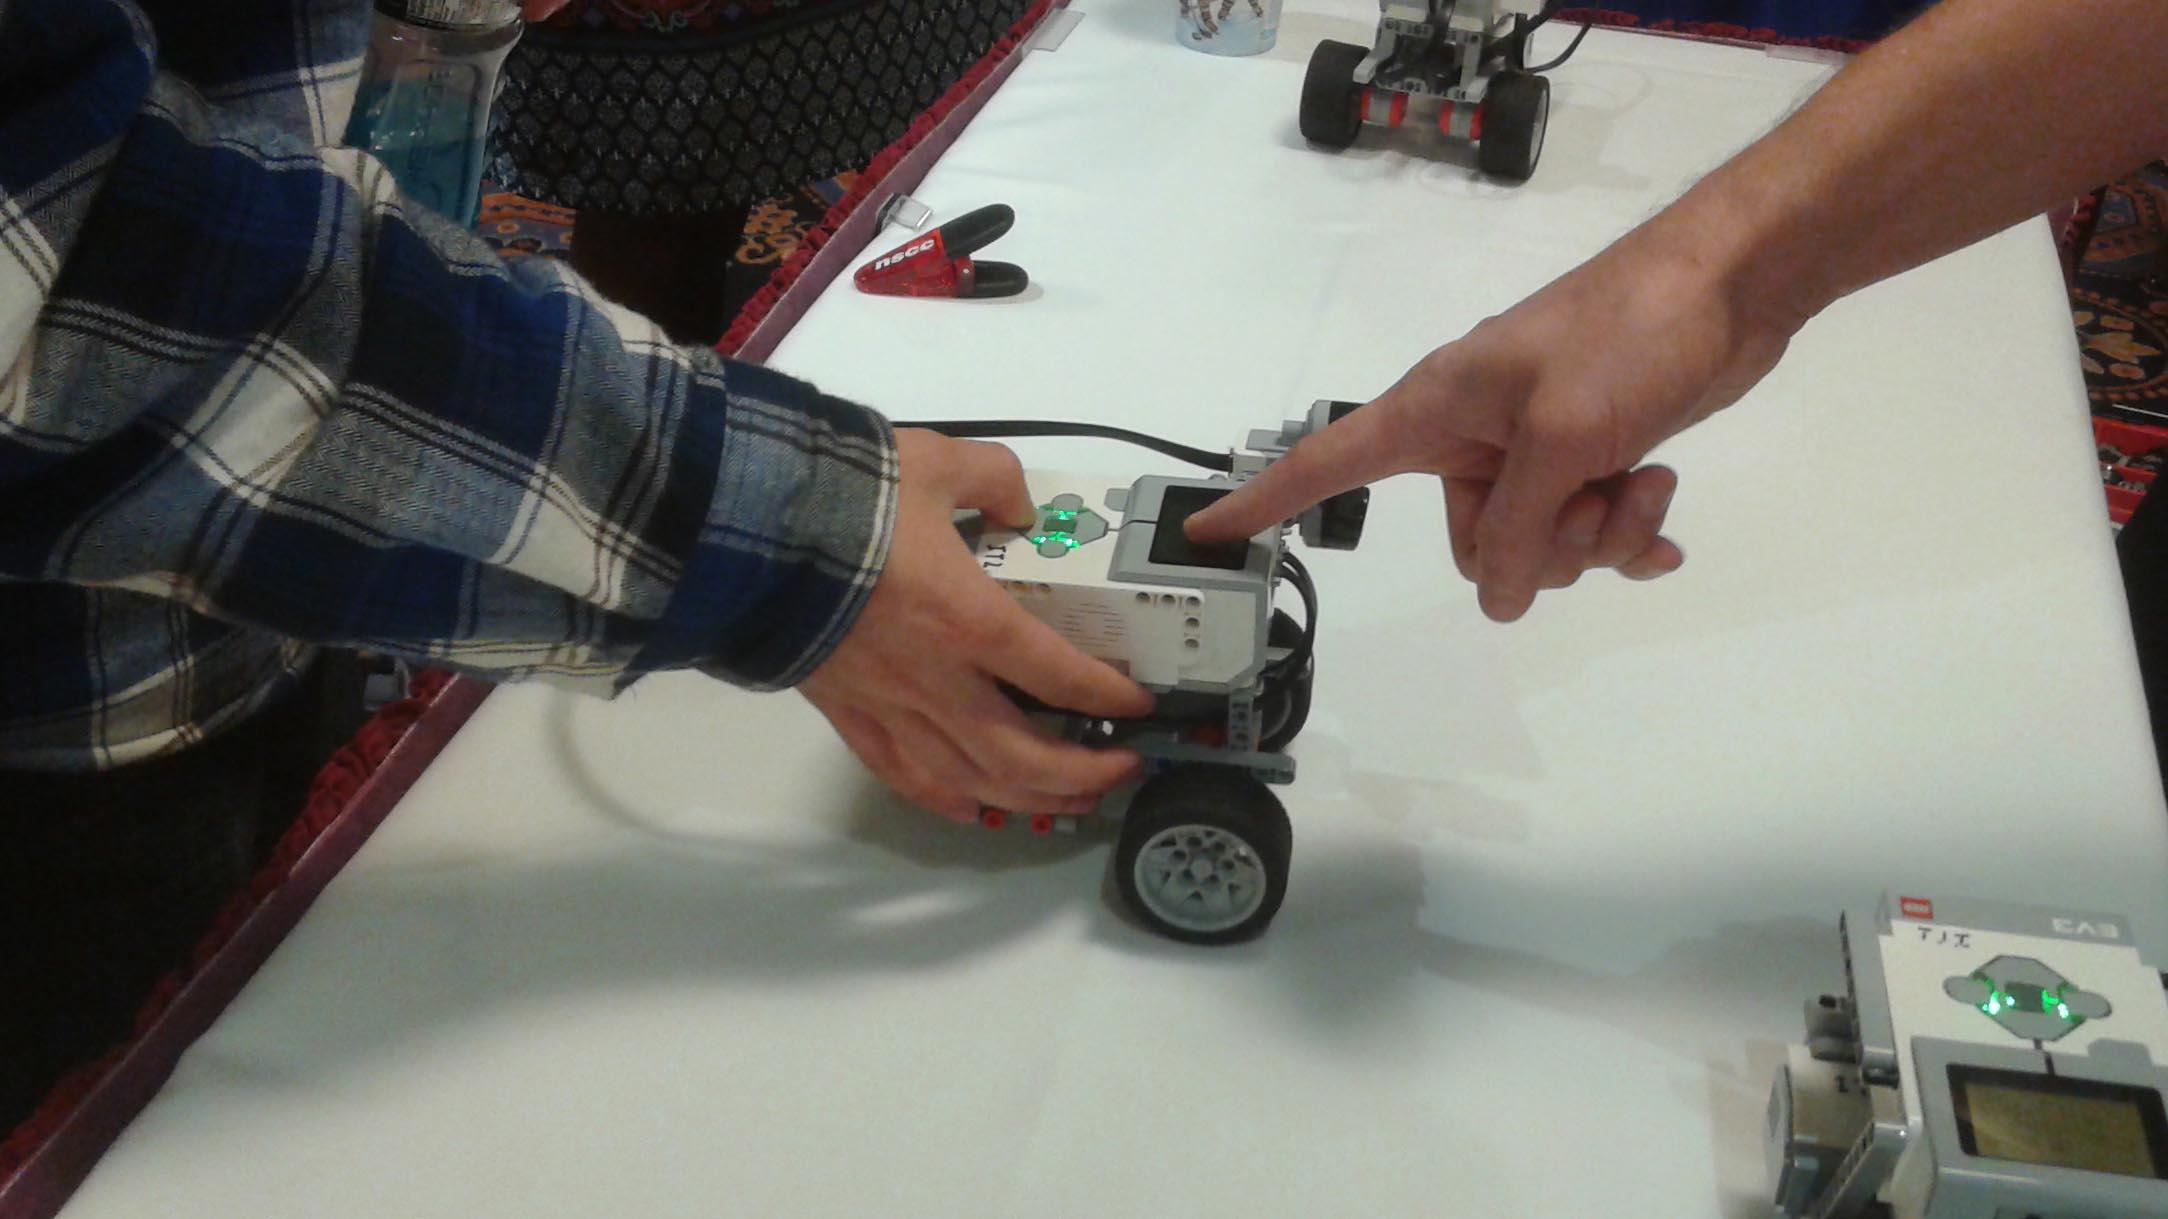 A Nova Scotia Community College recruit shows a student how to use a Lego robot.